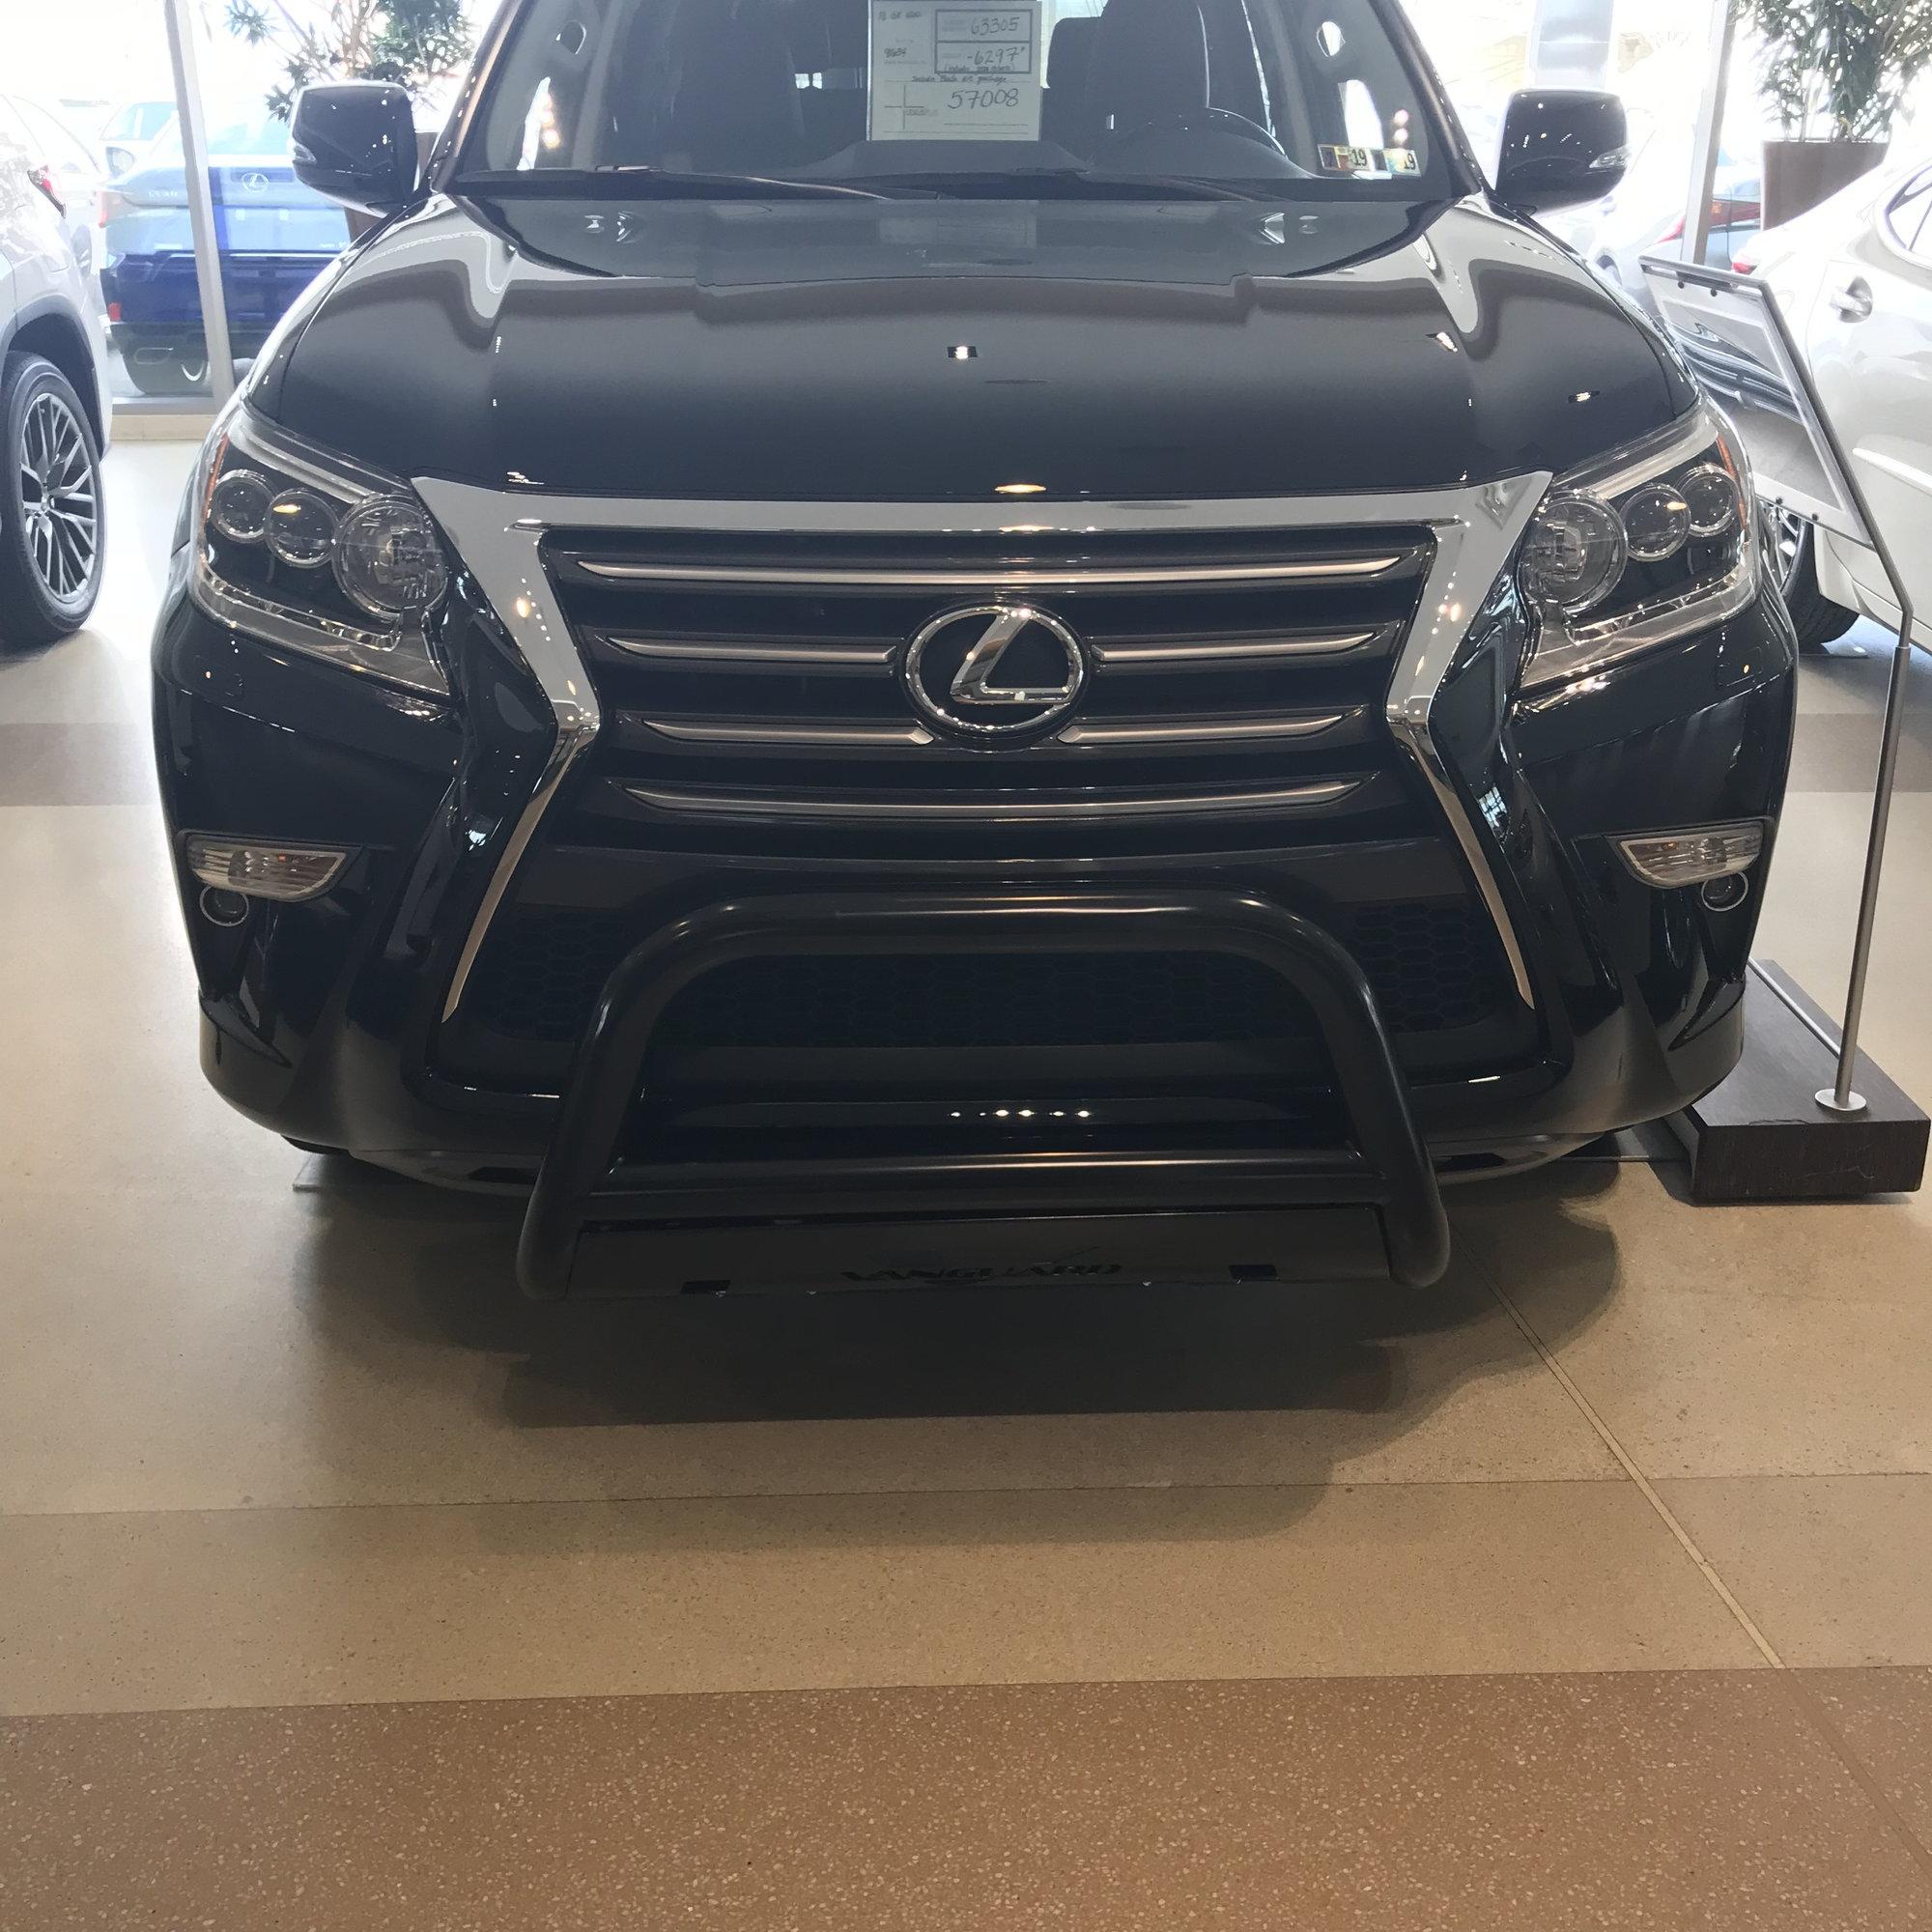 Opinions on an ARB Bumper on 14+ GX - ClubLexus - Lexus